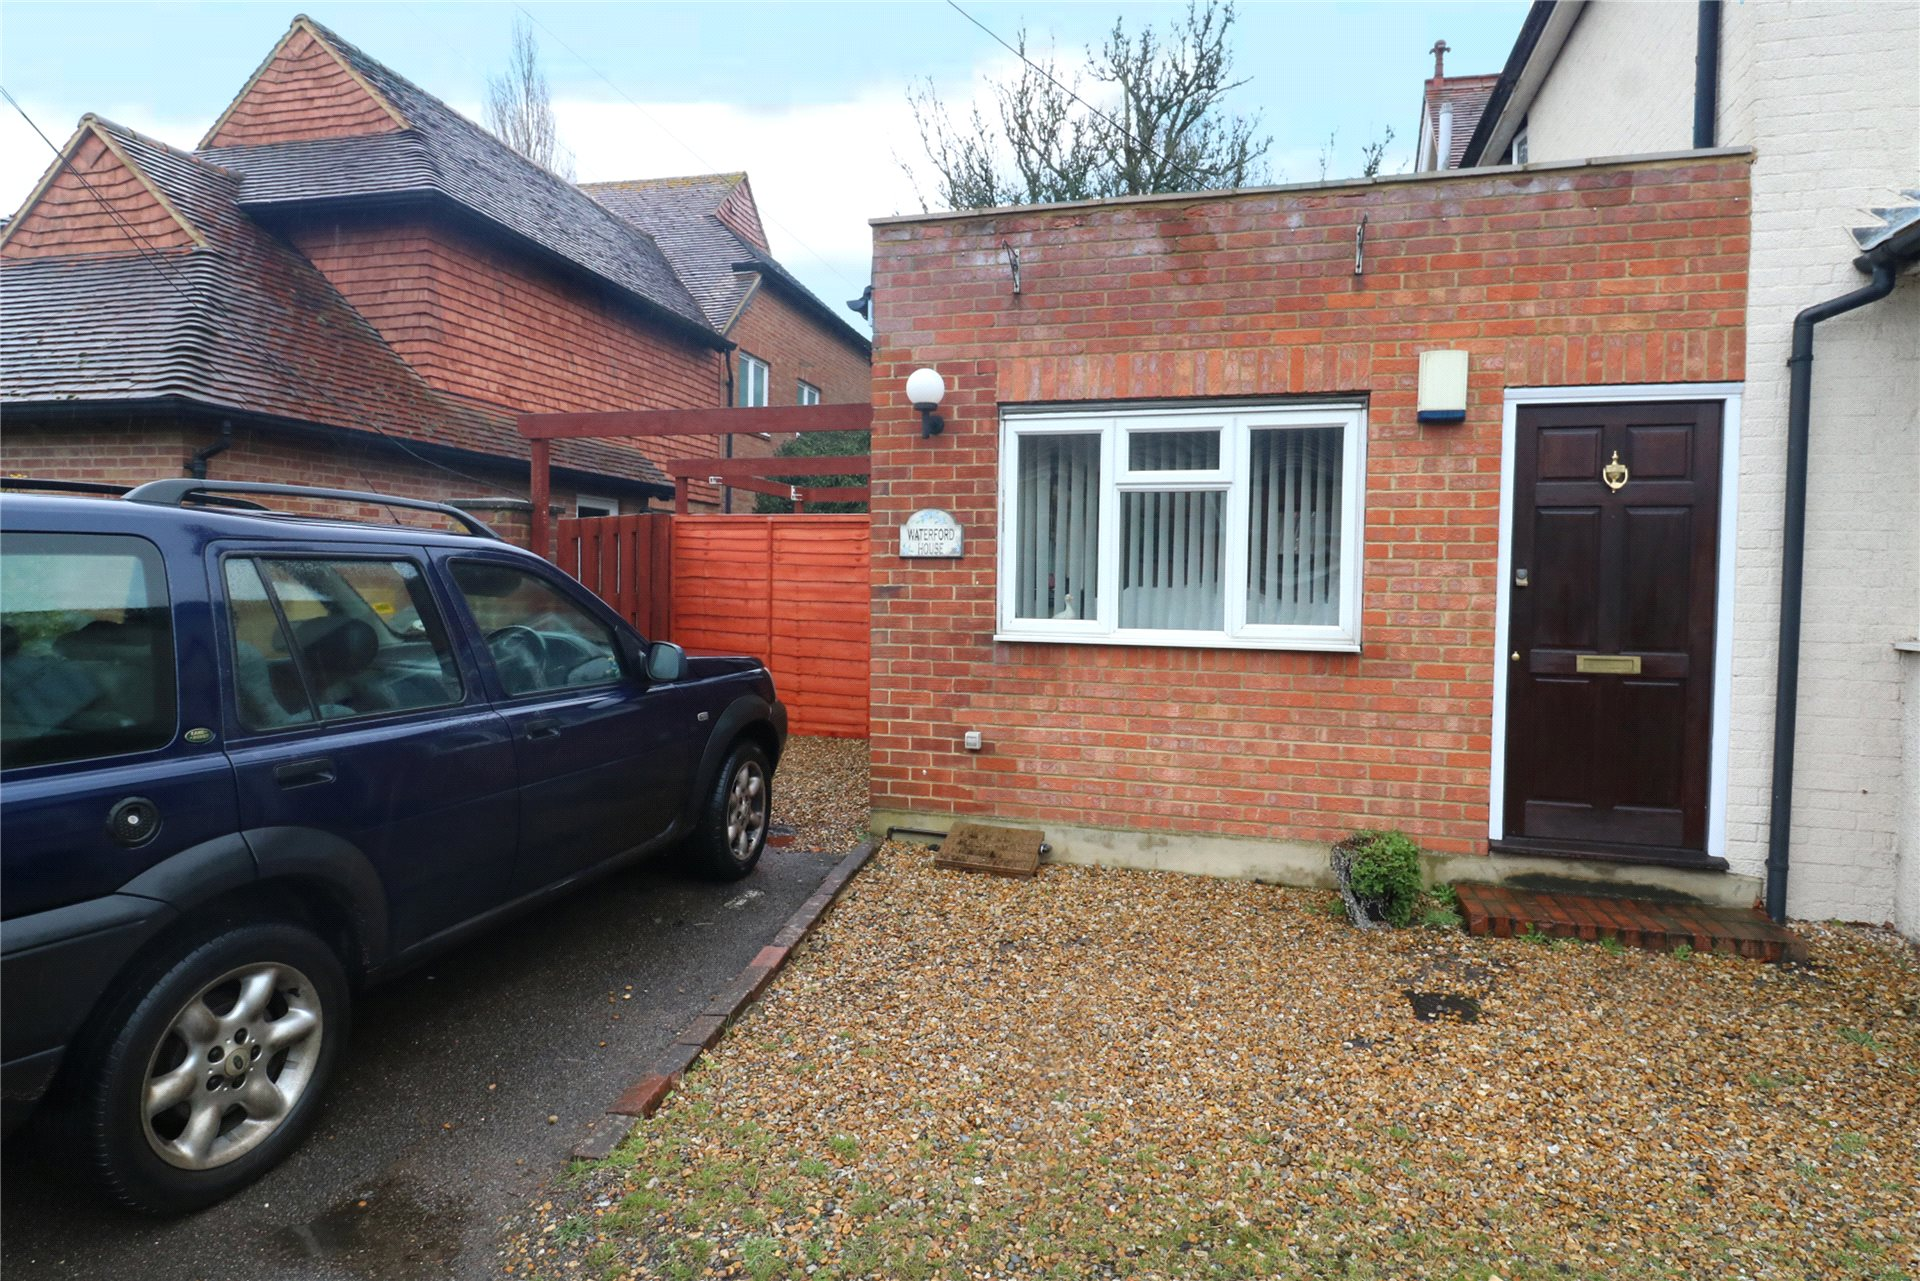 1 Bedroom Semi Detached House for sale in The Street, Eversley, Hook, RG27